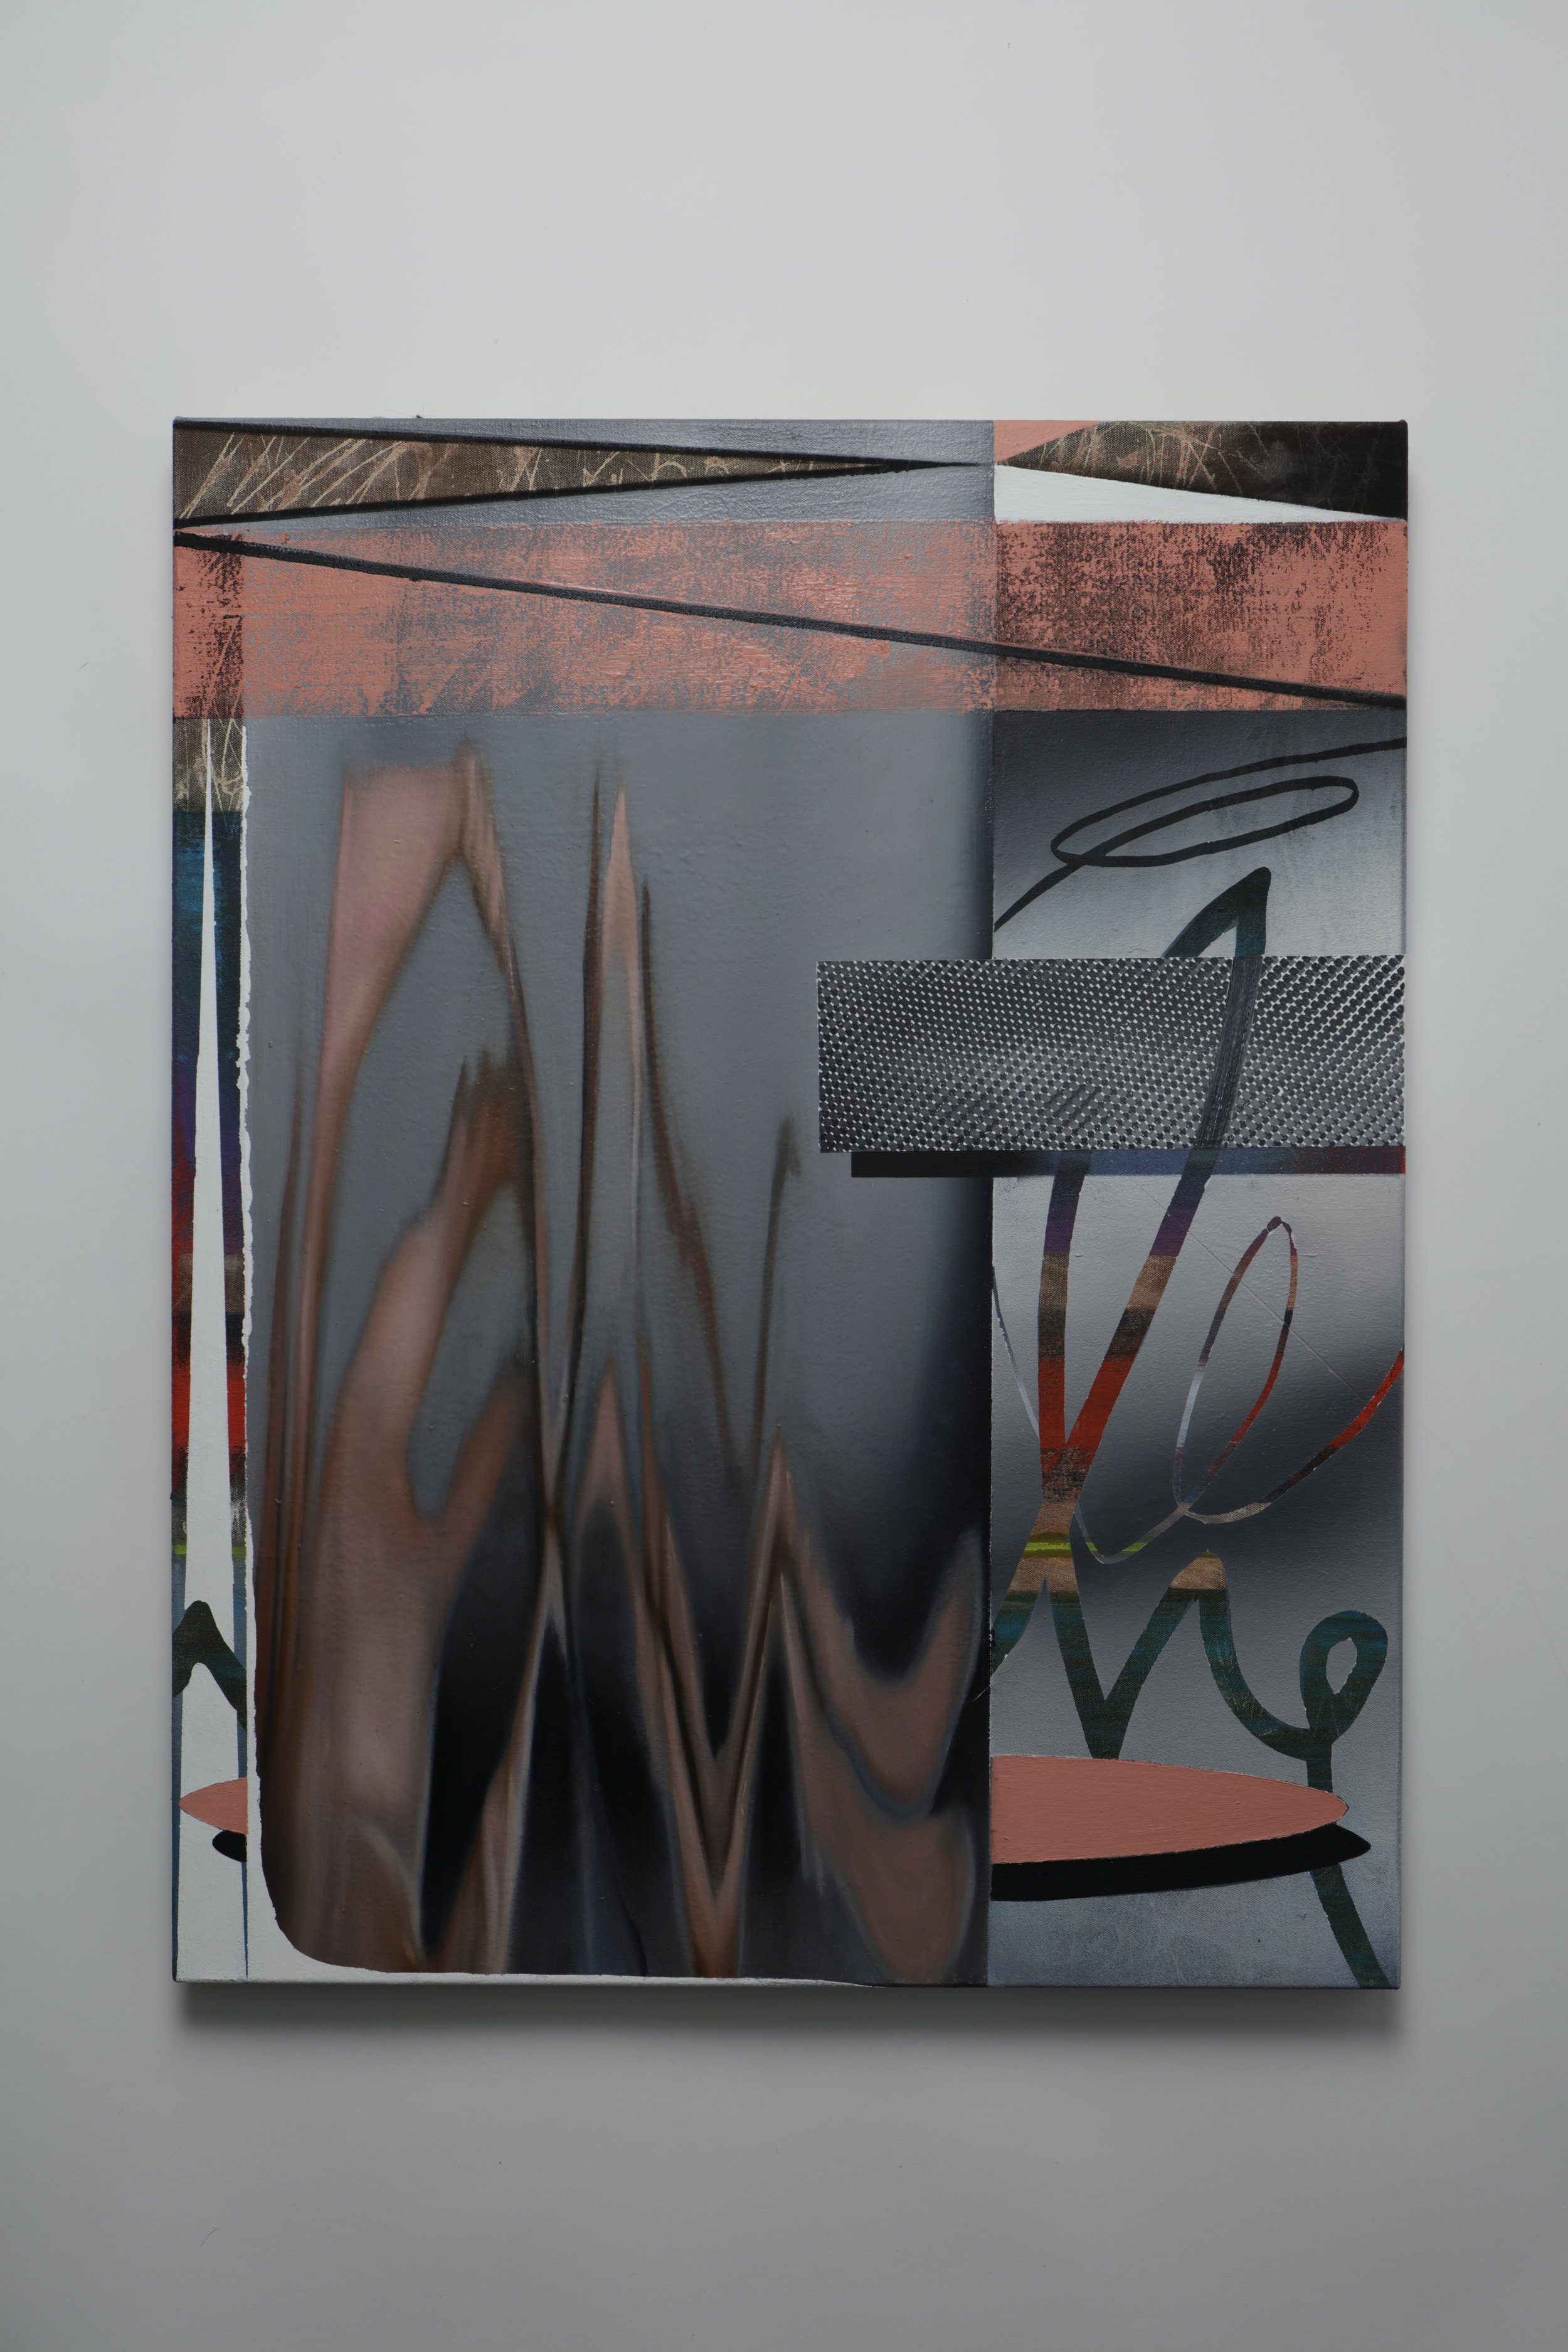 Spiralized -  Oil on canvas - 55cm x 70cm - 2018